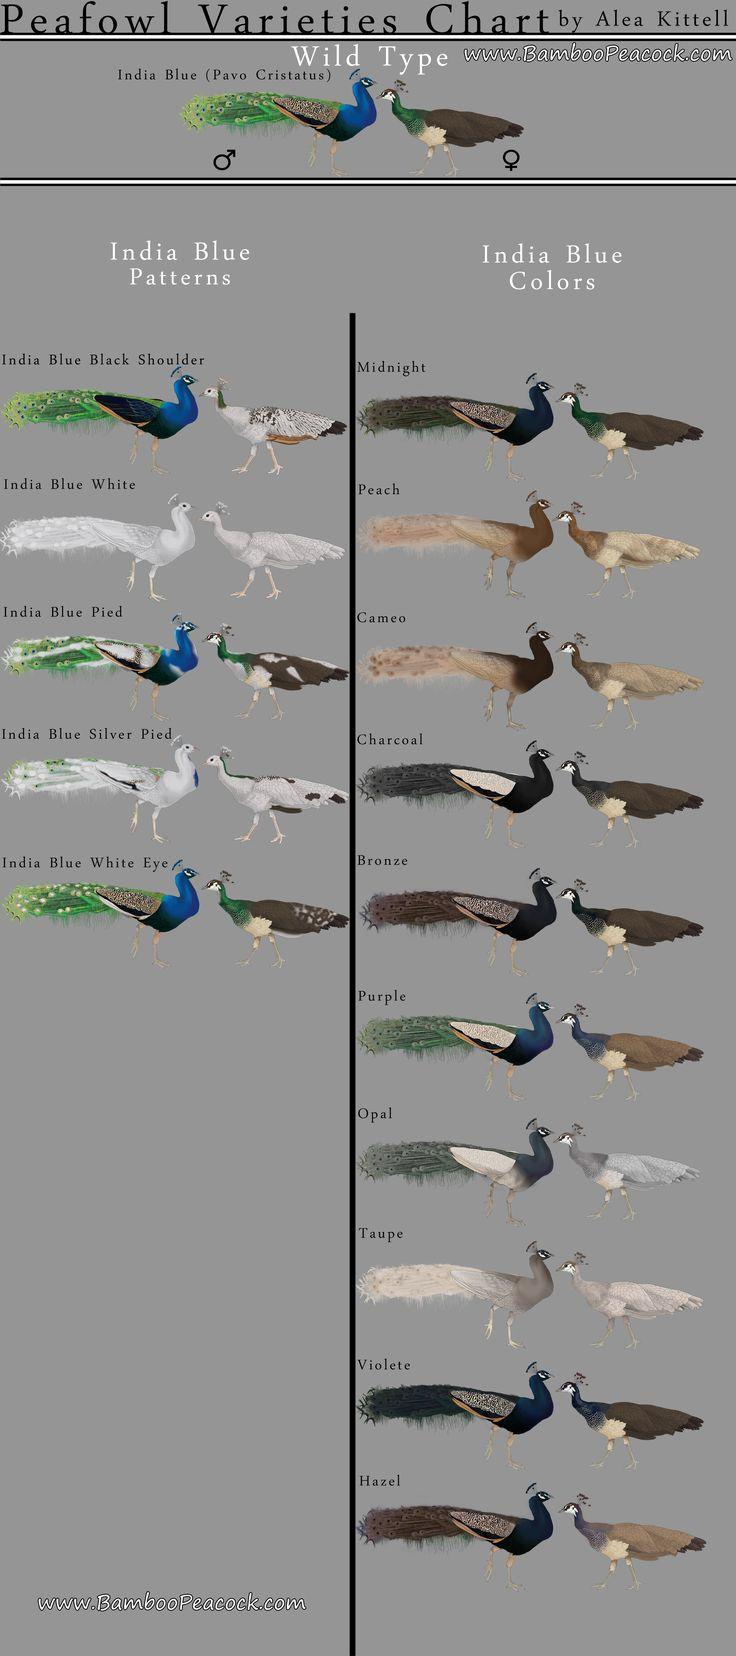 Indian Peafowl Varieties Chart More